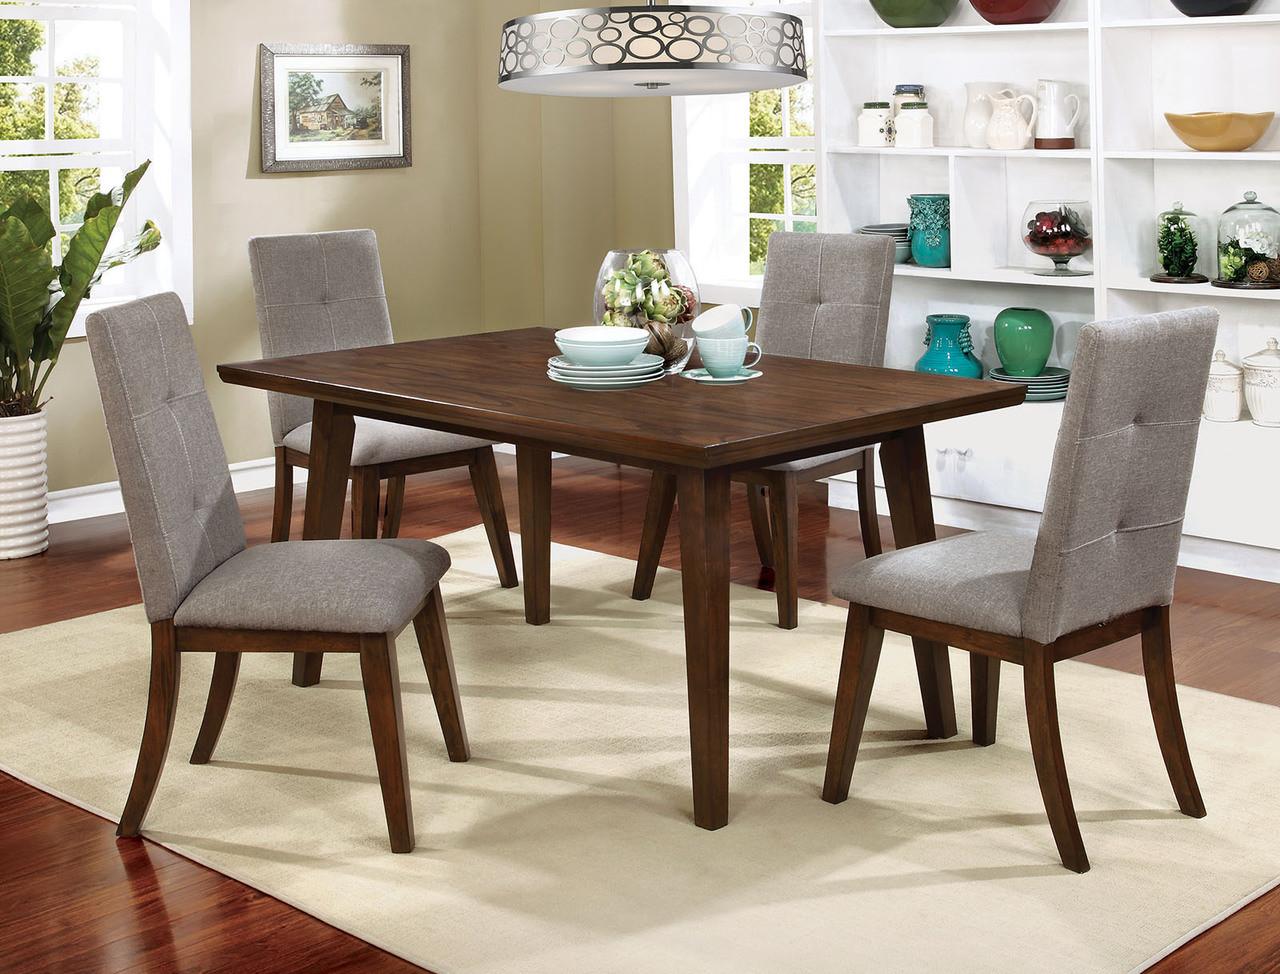 Furniture of America Walnut Dining Table Set | CM3354T